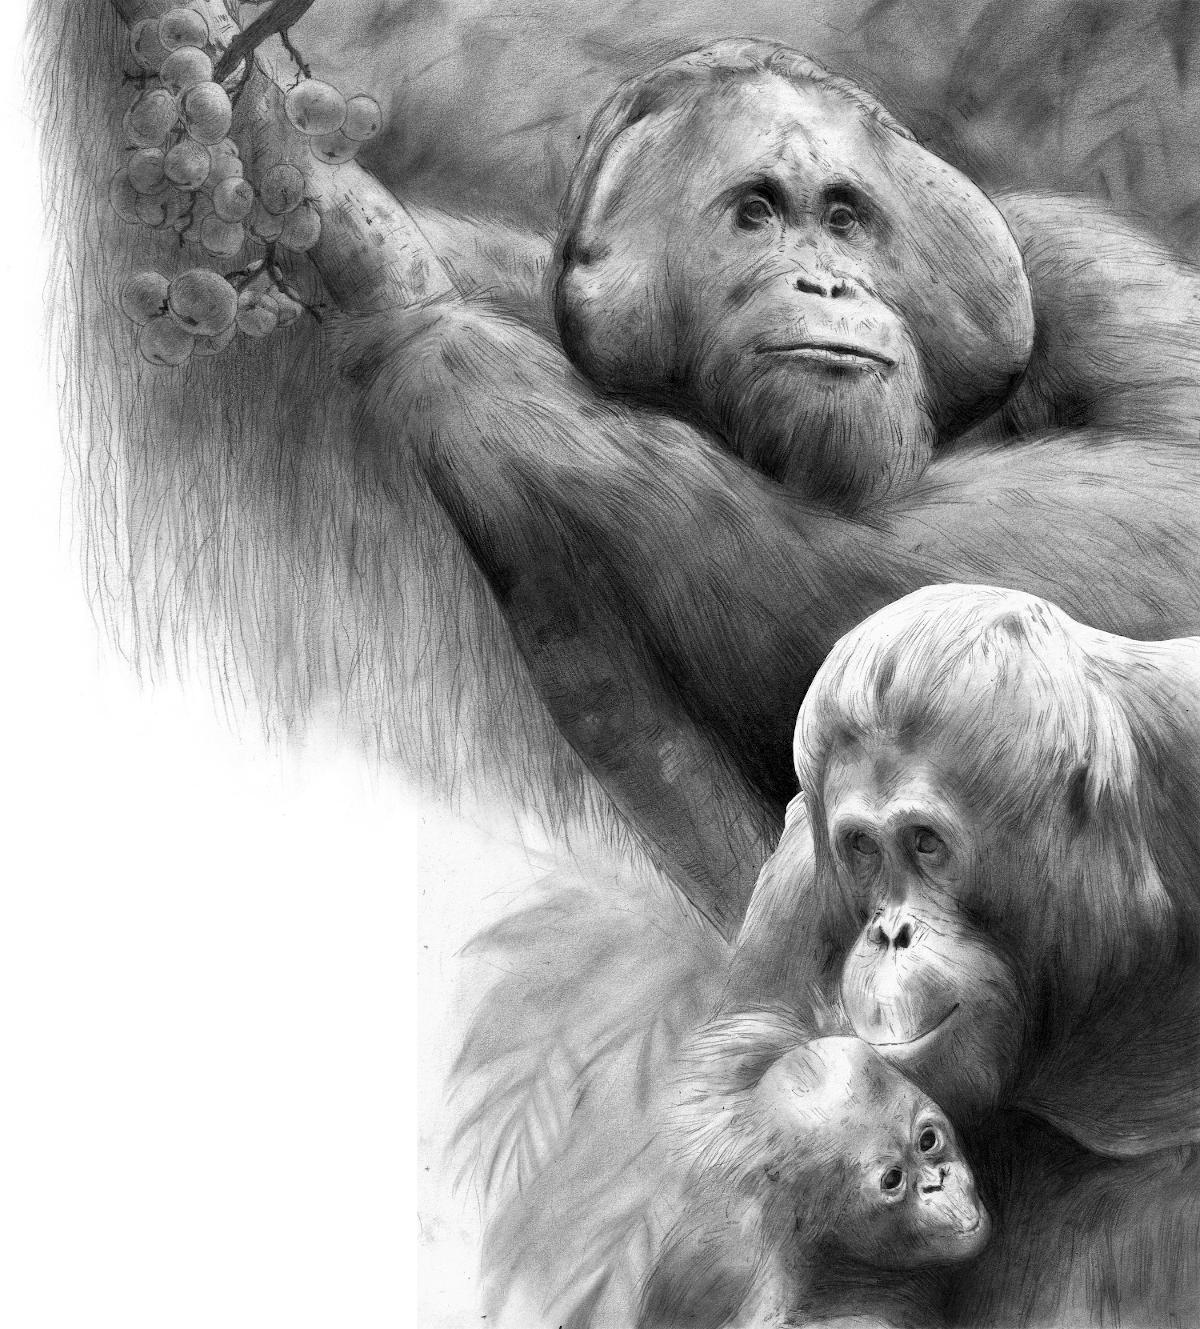 A detailed, lifelike black and white sketch of three orangutans.